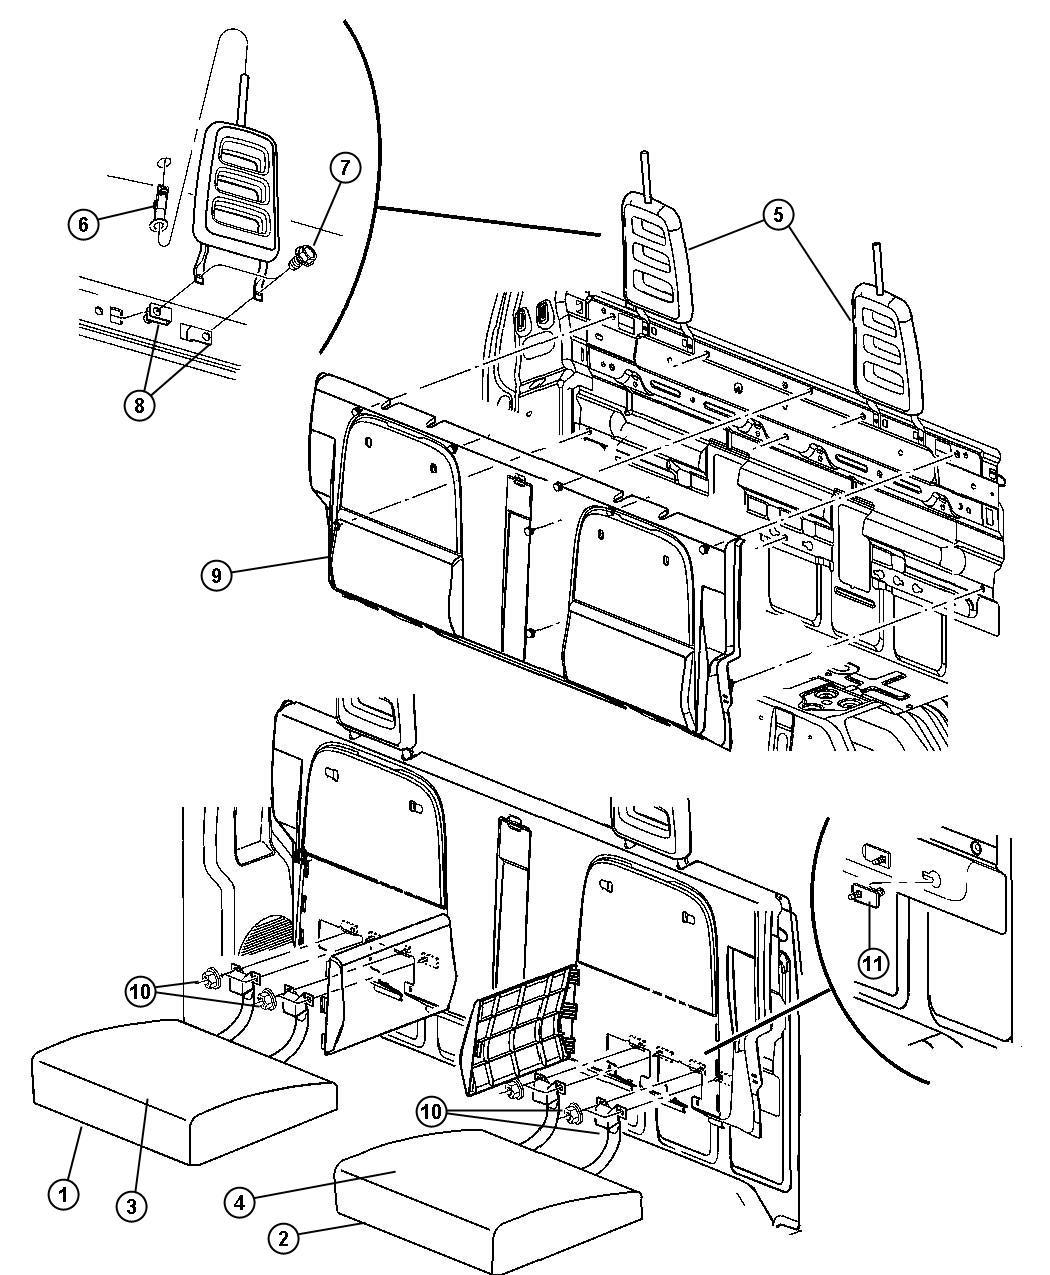 tags: #trailblazer engine diagram#polaris trailblazer 250 parts diagram#2002  chevrolet trailblazer parts diagram#2007 chevy trailblazer parts diagrams#2004